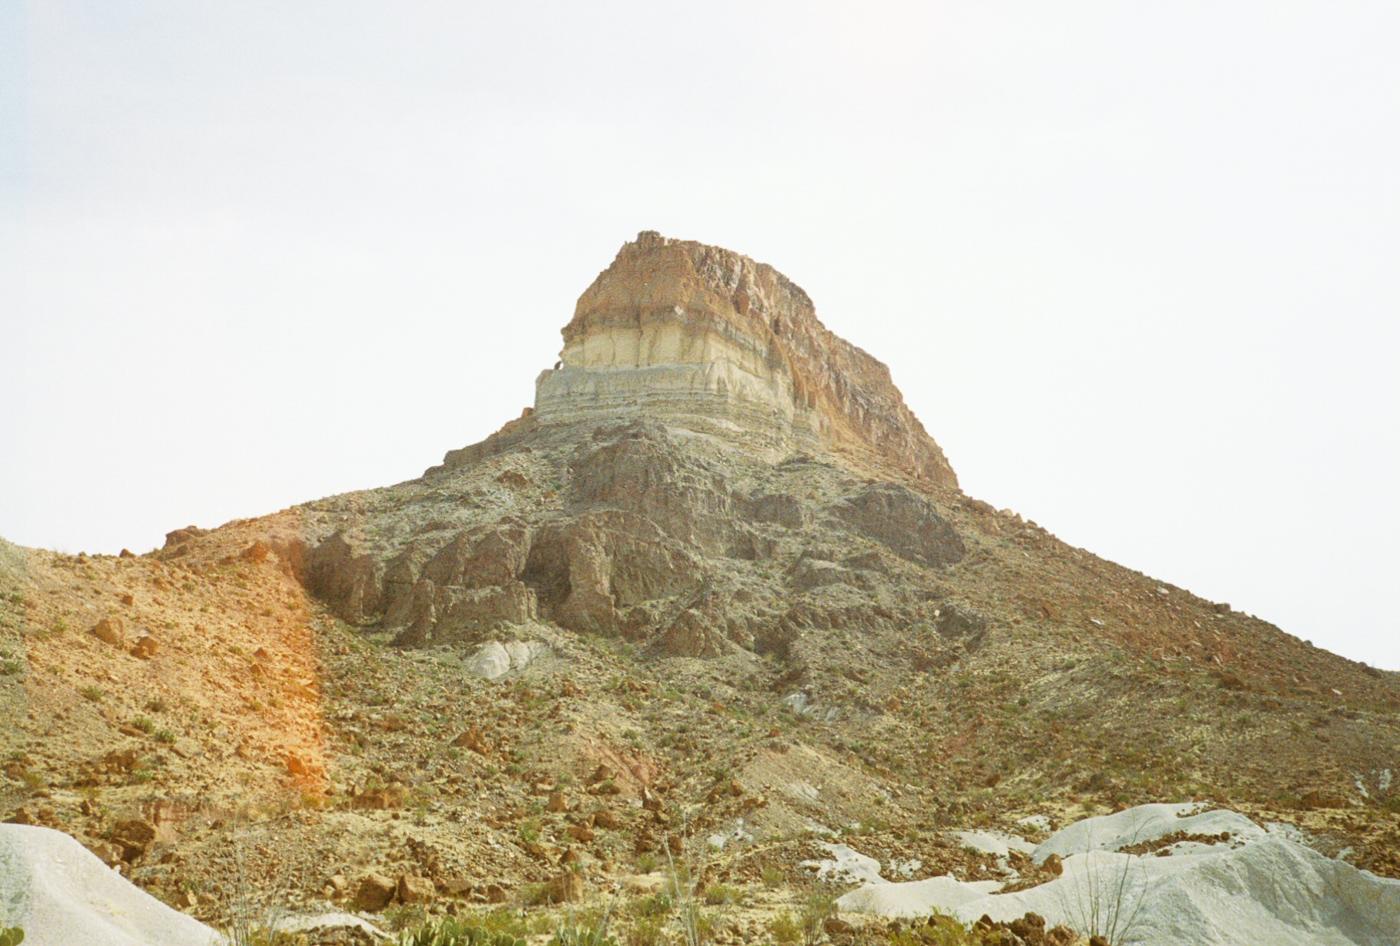 film 35mm lomo olympus hike camp big bend texas america yall pawlowski light